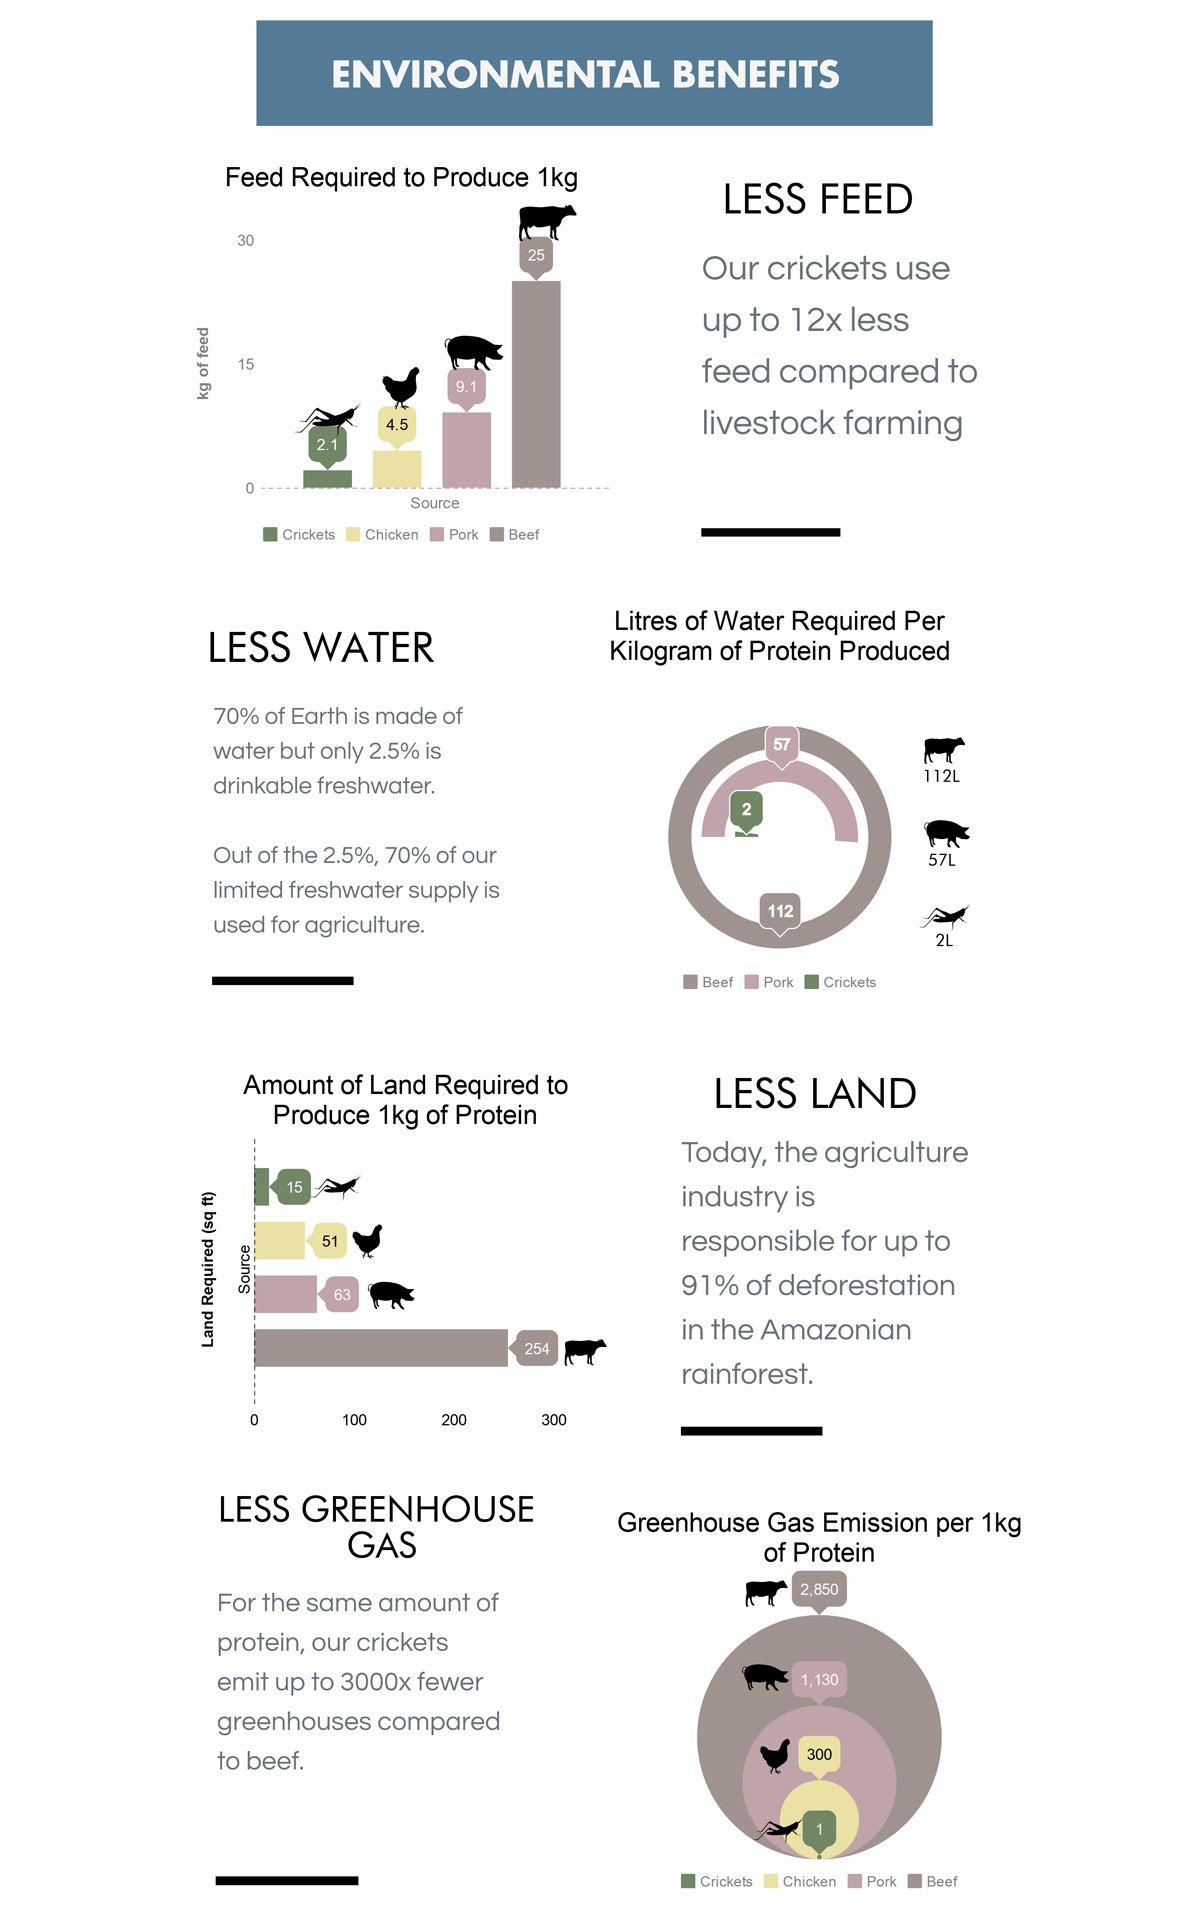 Infographic courtesy of Ento.